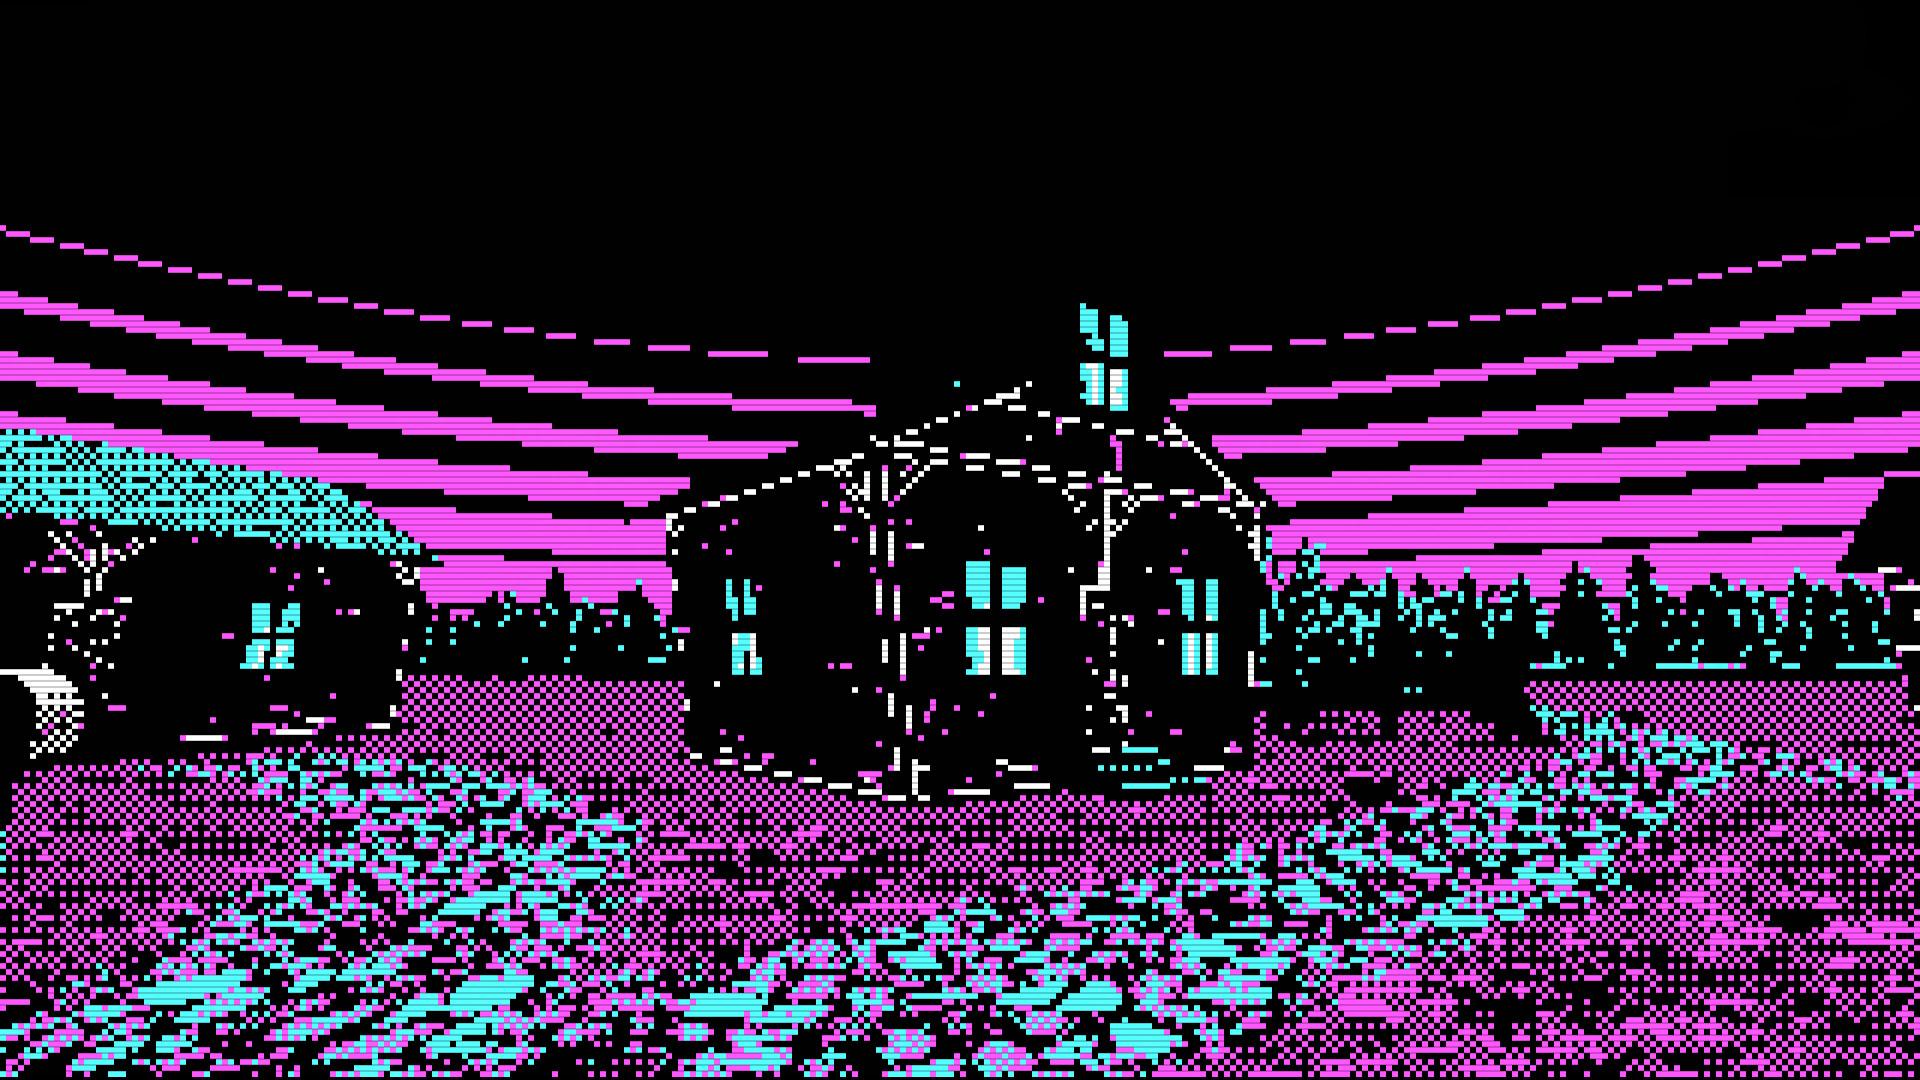 General 1920x1080 vaporwave synthwave Retrowave pixel art pixelated house